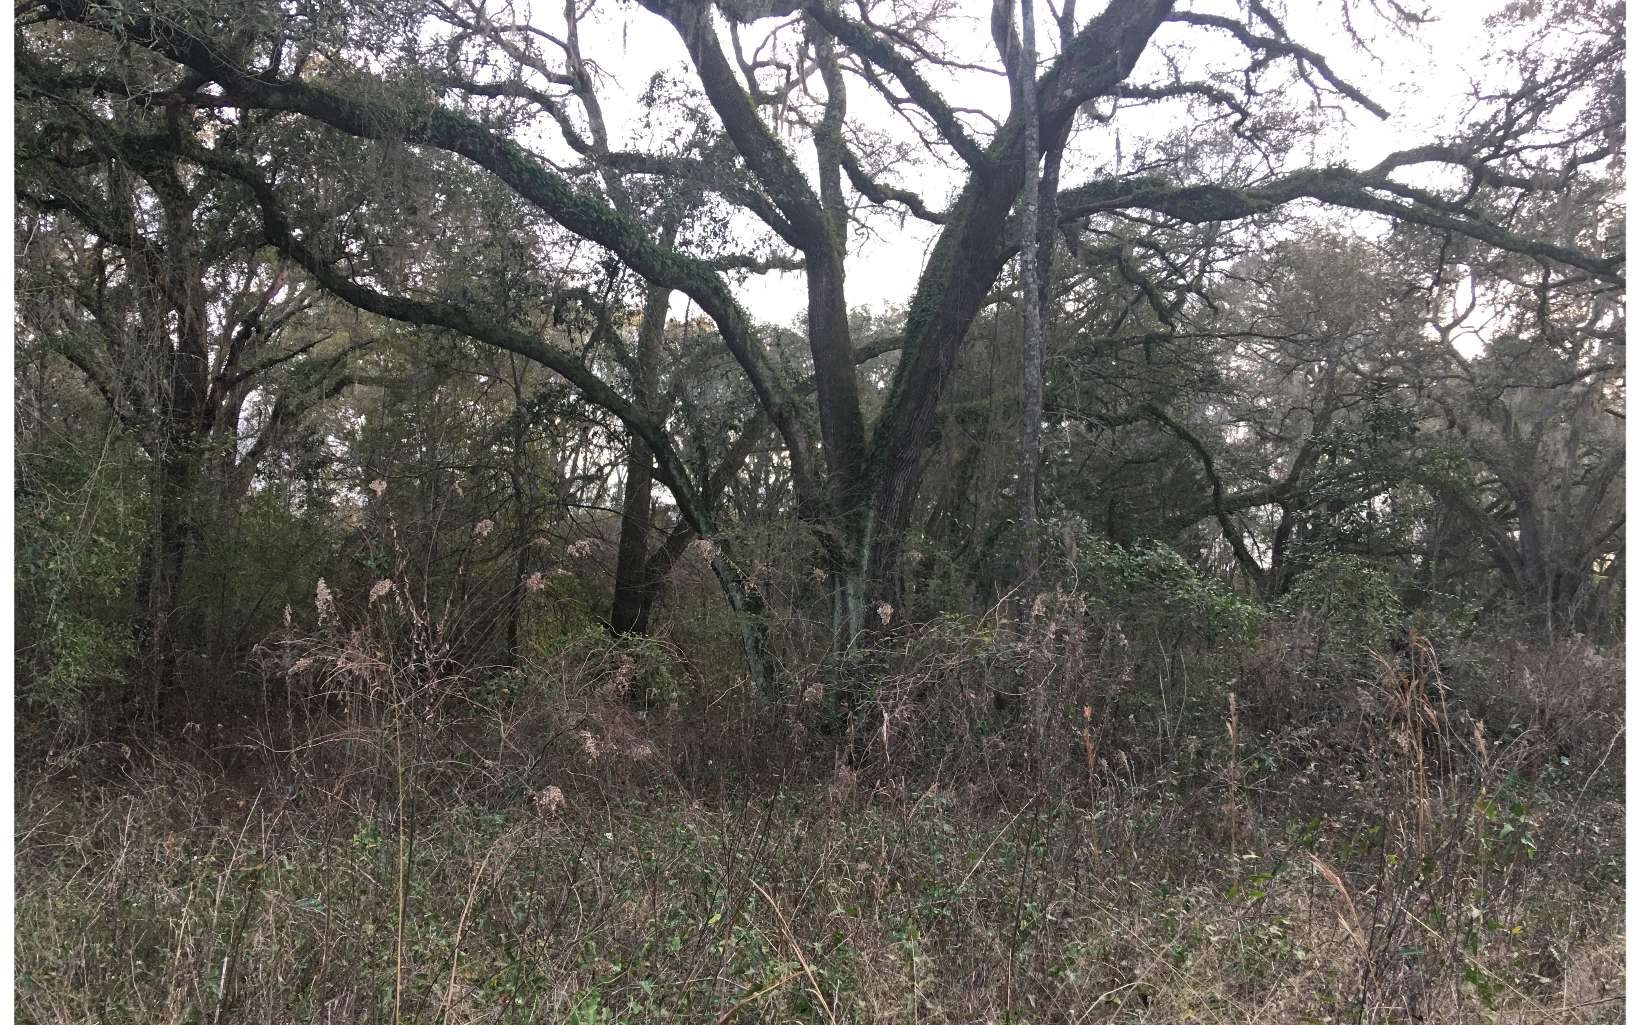 4.43 acres, former home site